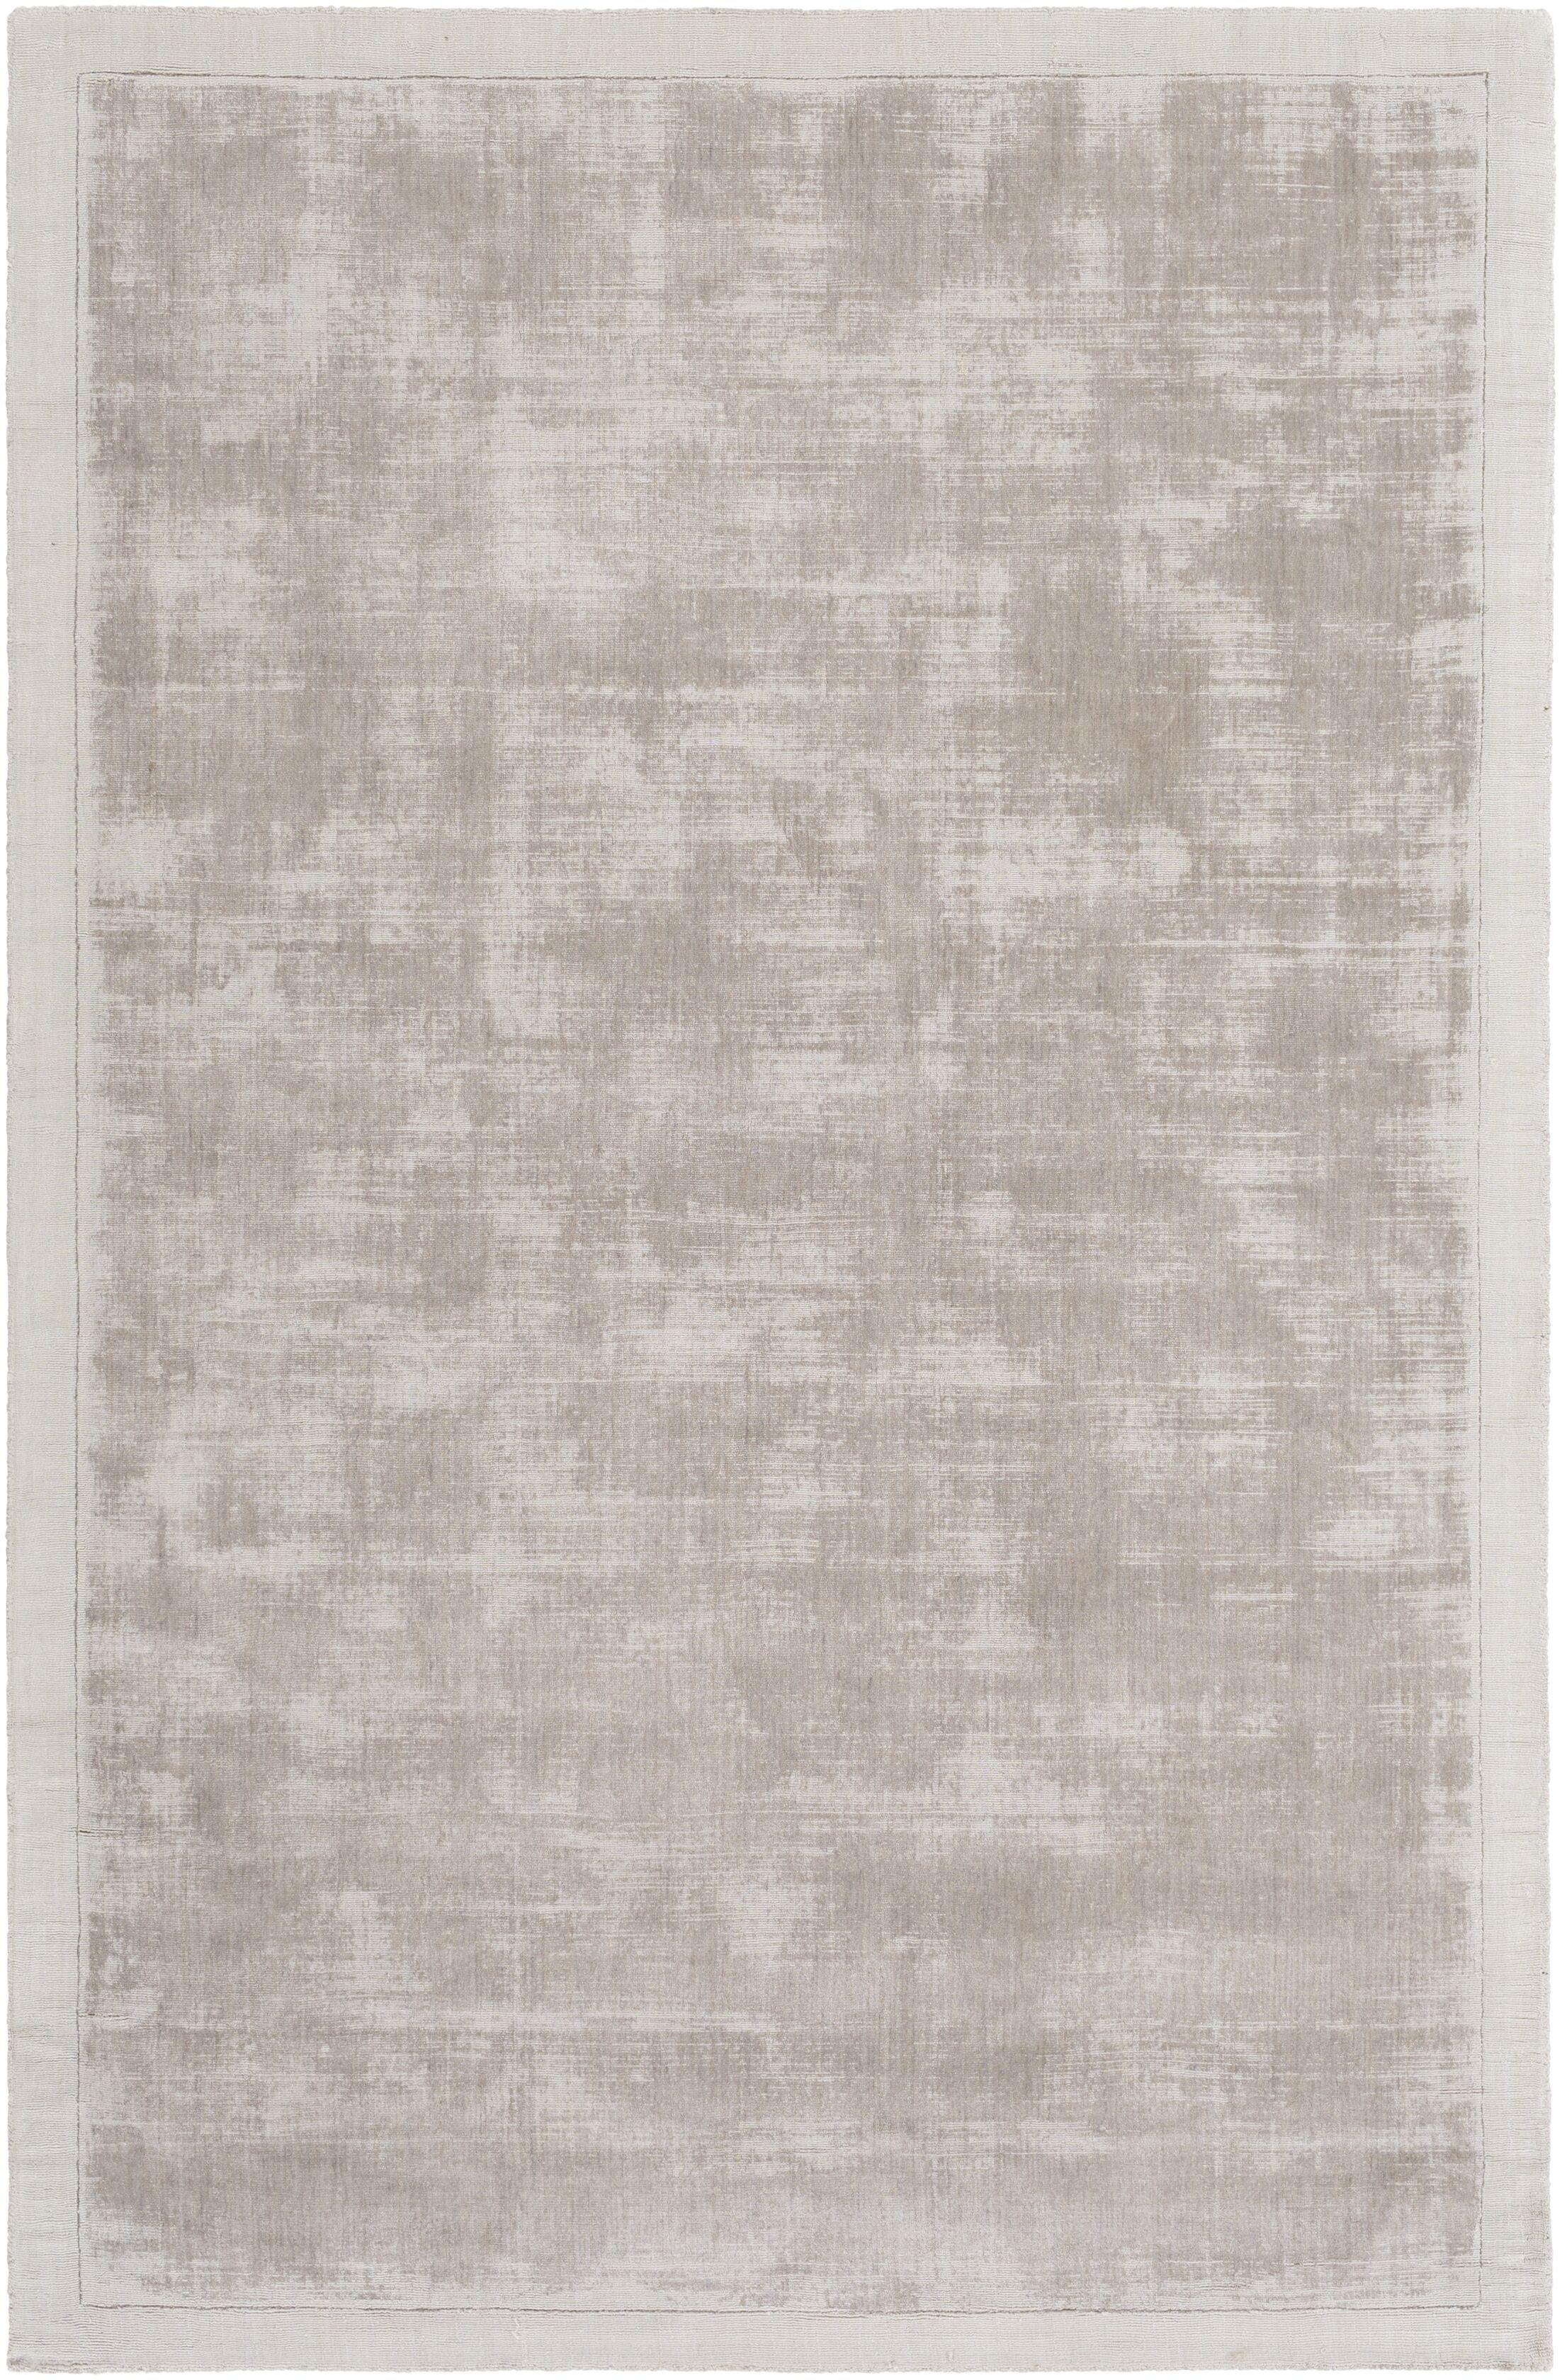 Natalie Hand-Loomed Gray Area Rug Rug Size: Rectangle 3' x 5'